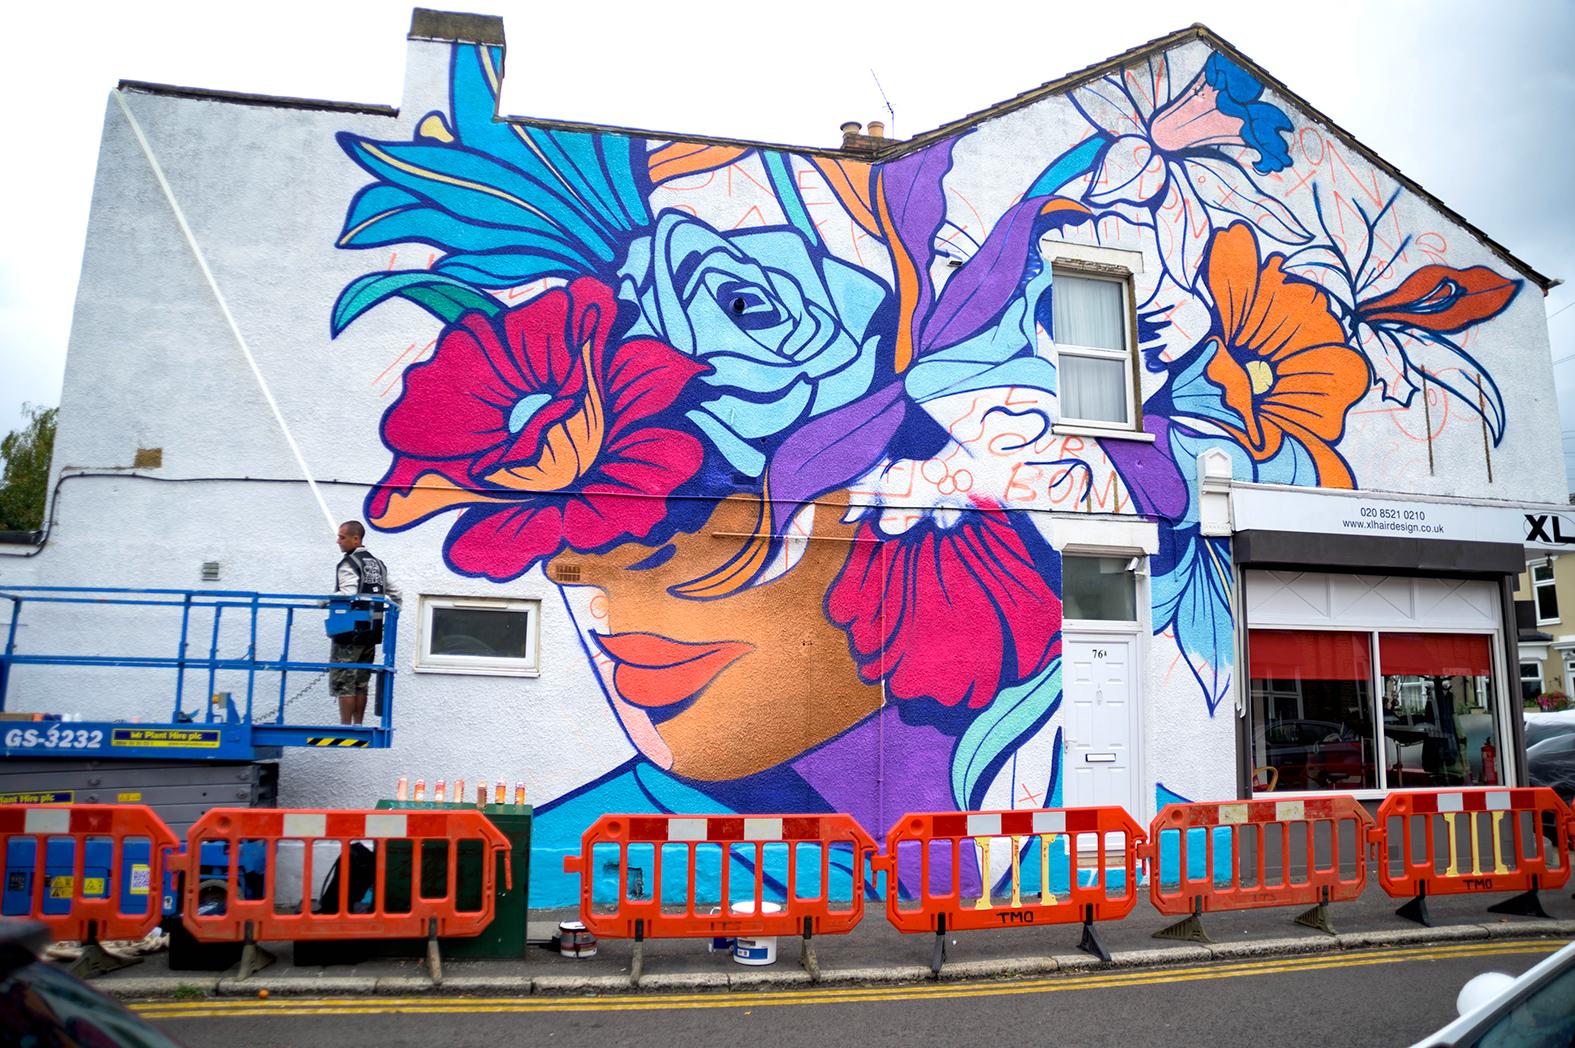 NERONE-mural-london-street-art-2